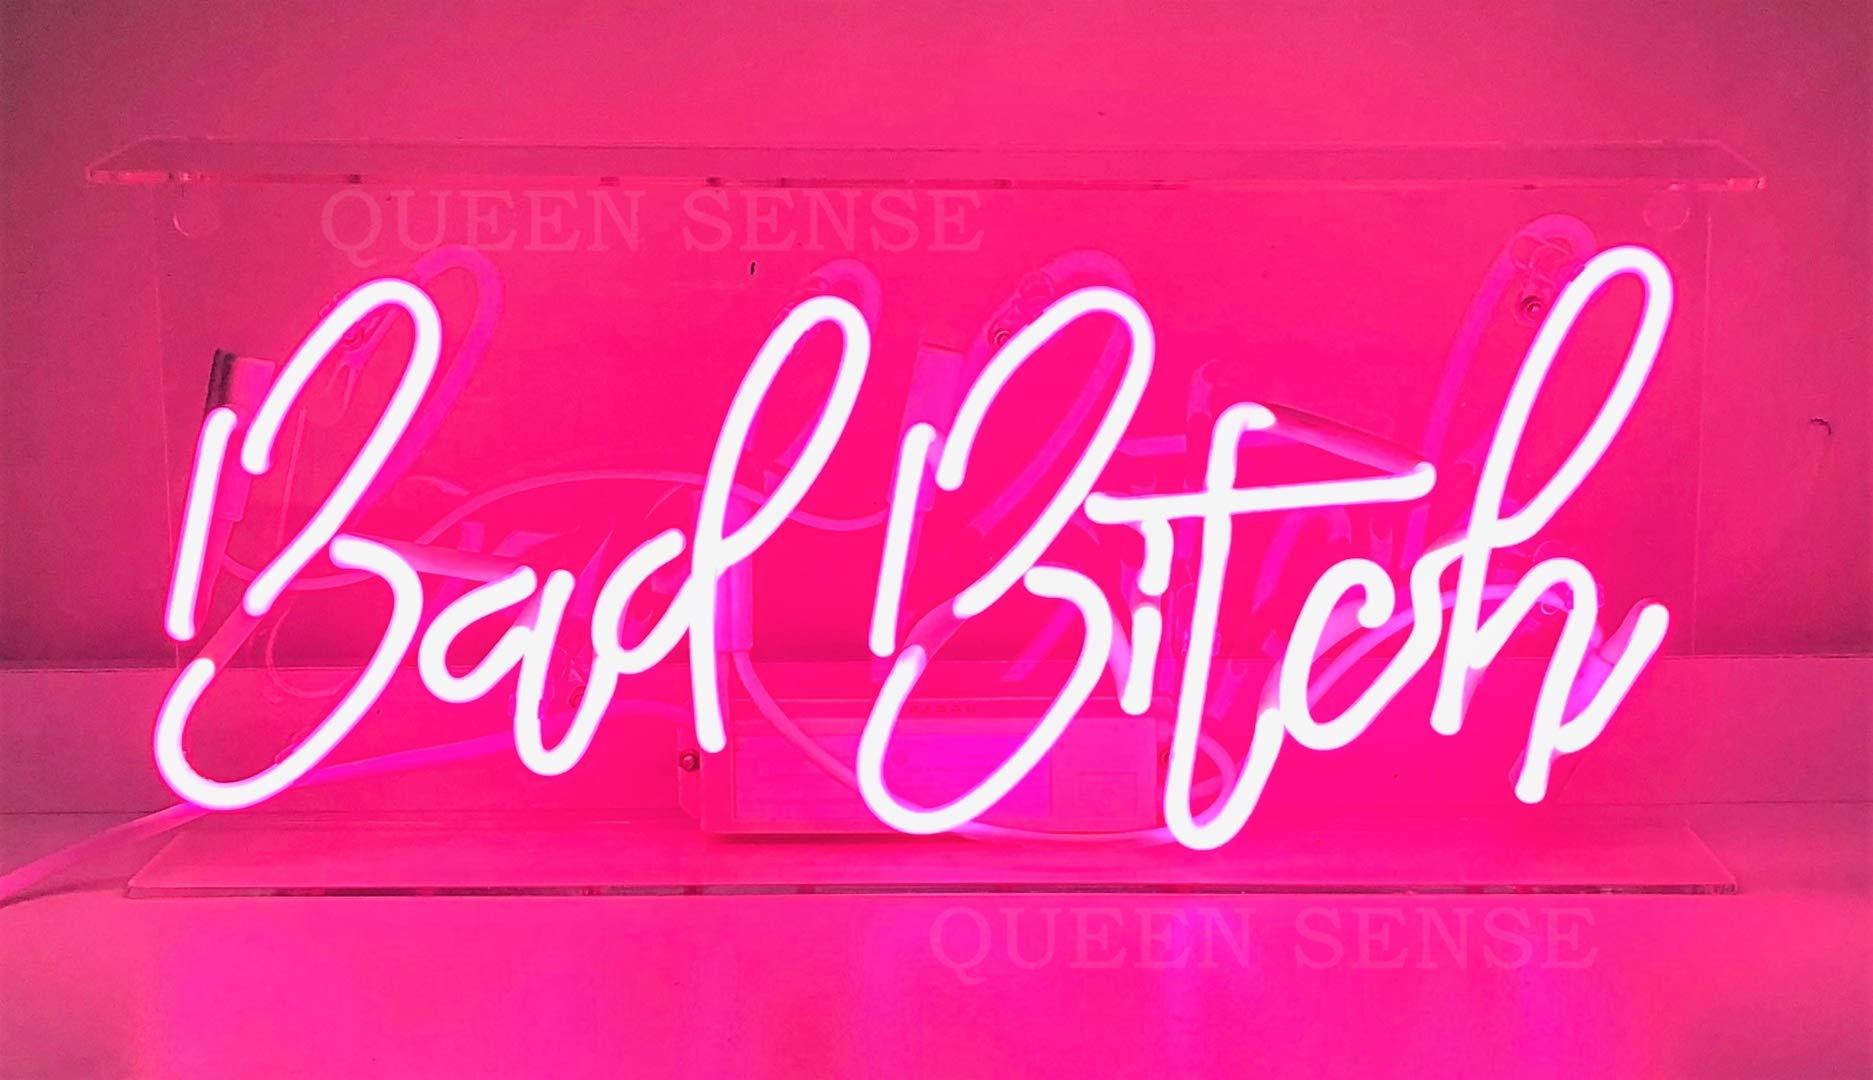 Queen Sense 14'' Bad Bitch Neon Sign Light Decorated Acrylic Panel Handmade Beer Bar Pub Man Cave Lamp UT198 by Queen Sense